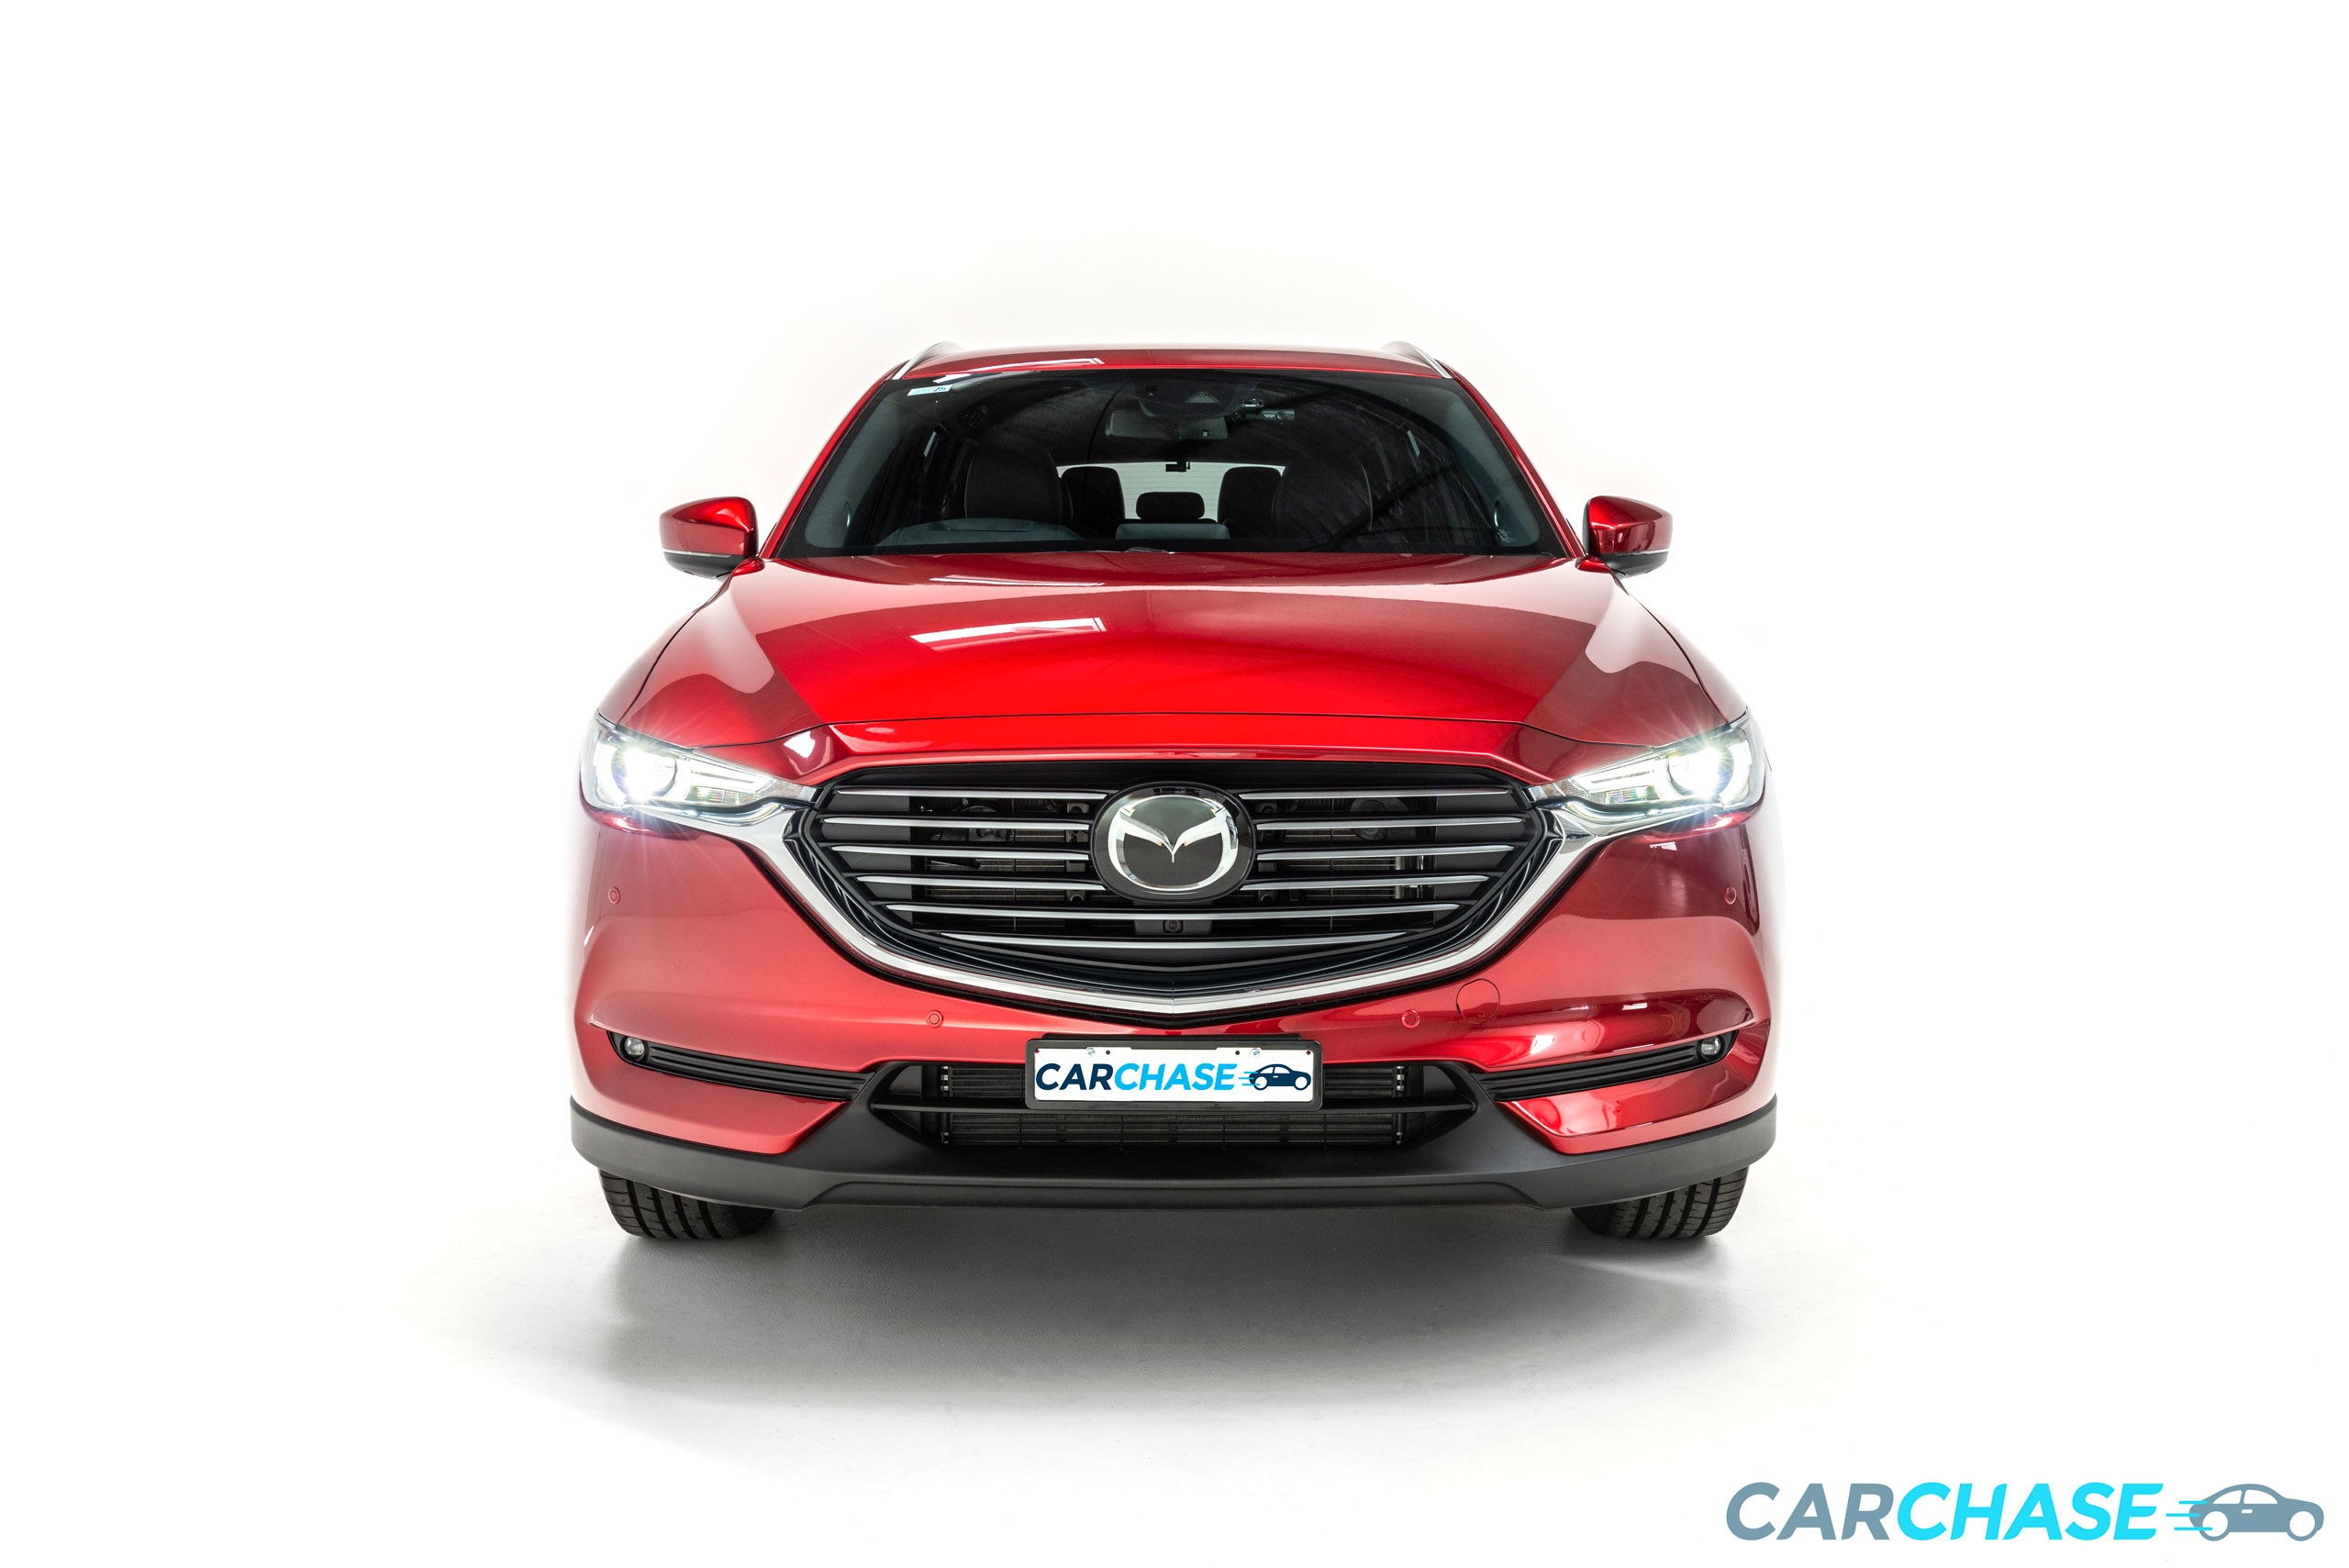 Image of front profile of 2018 Mazda CX-8 Asaki